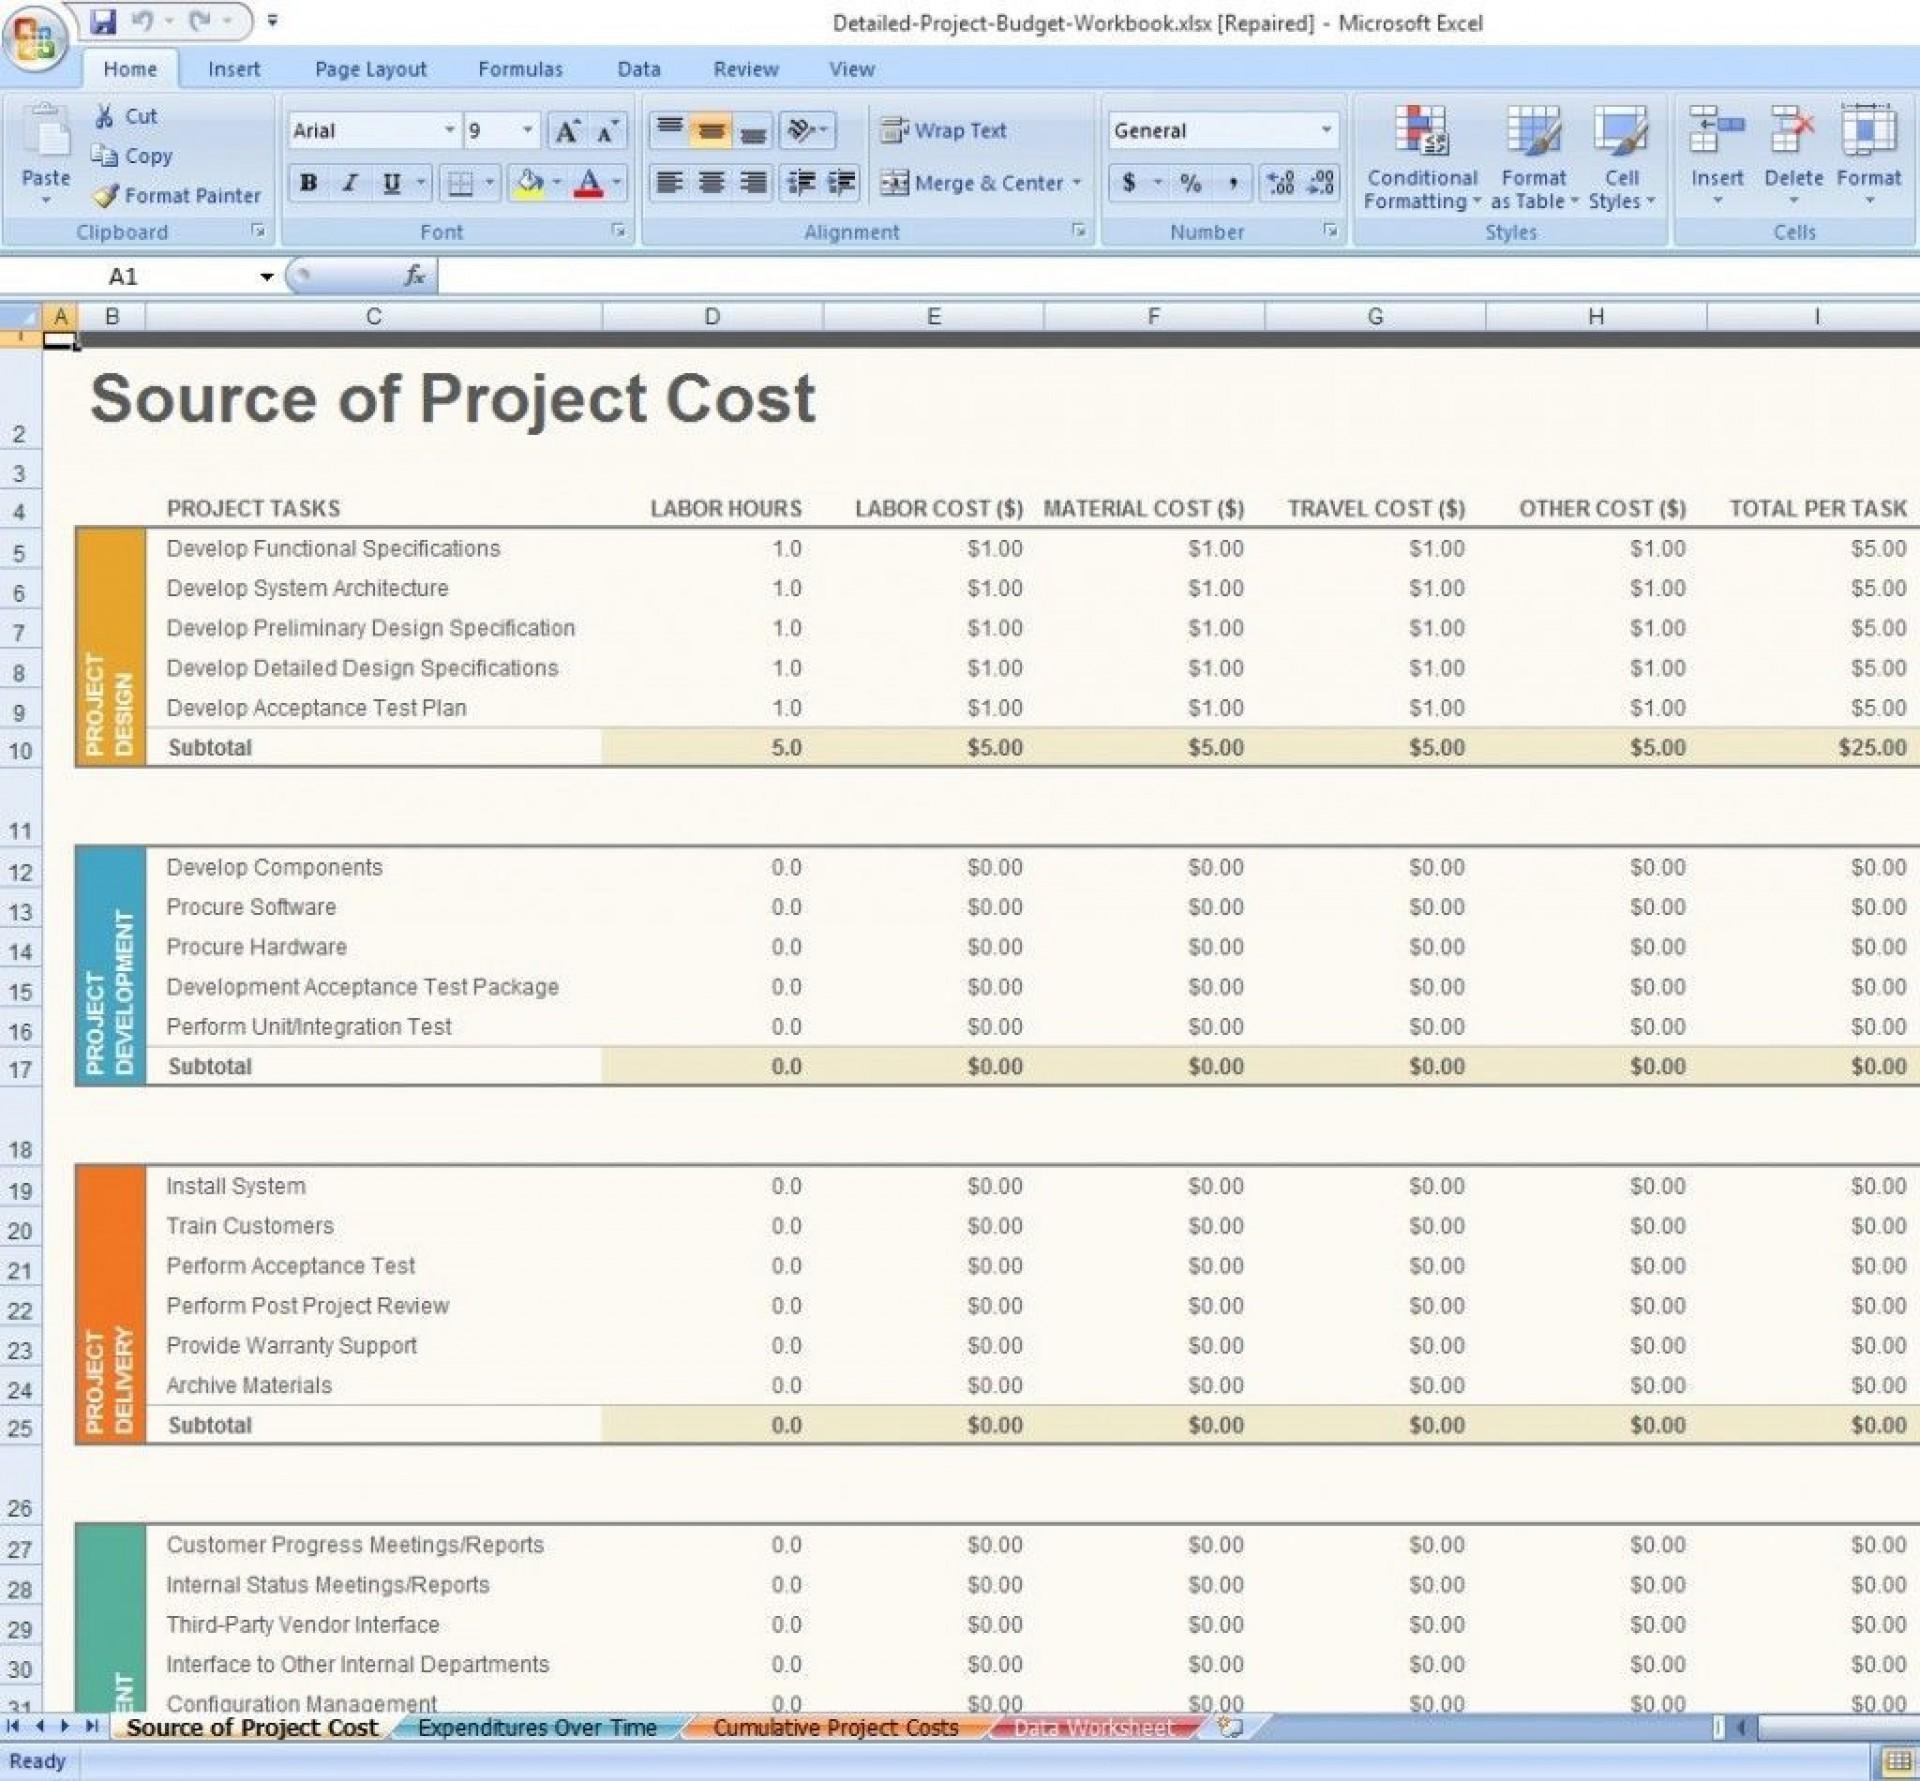 001 Excellent Project Management Form Free Download Design  Dashboard Excel Template Plan1920